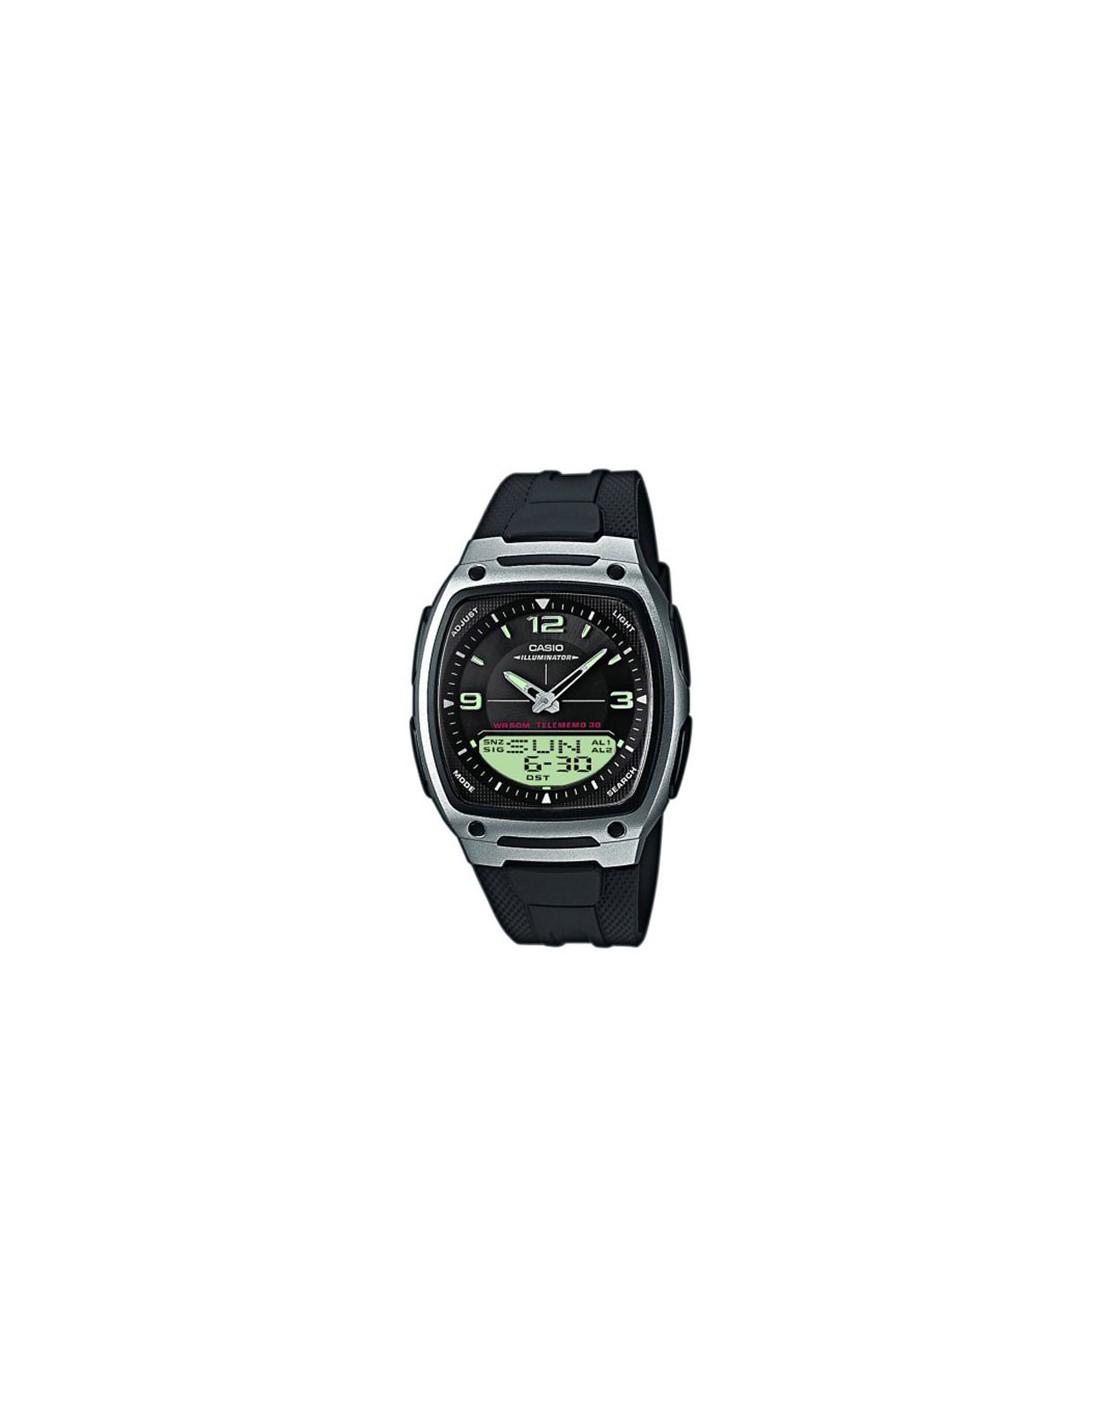 casio watch aw 81 1a1ves casio watches rh joyeriapato com Casio 2747 AW -80 Casio AW81 Resin